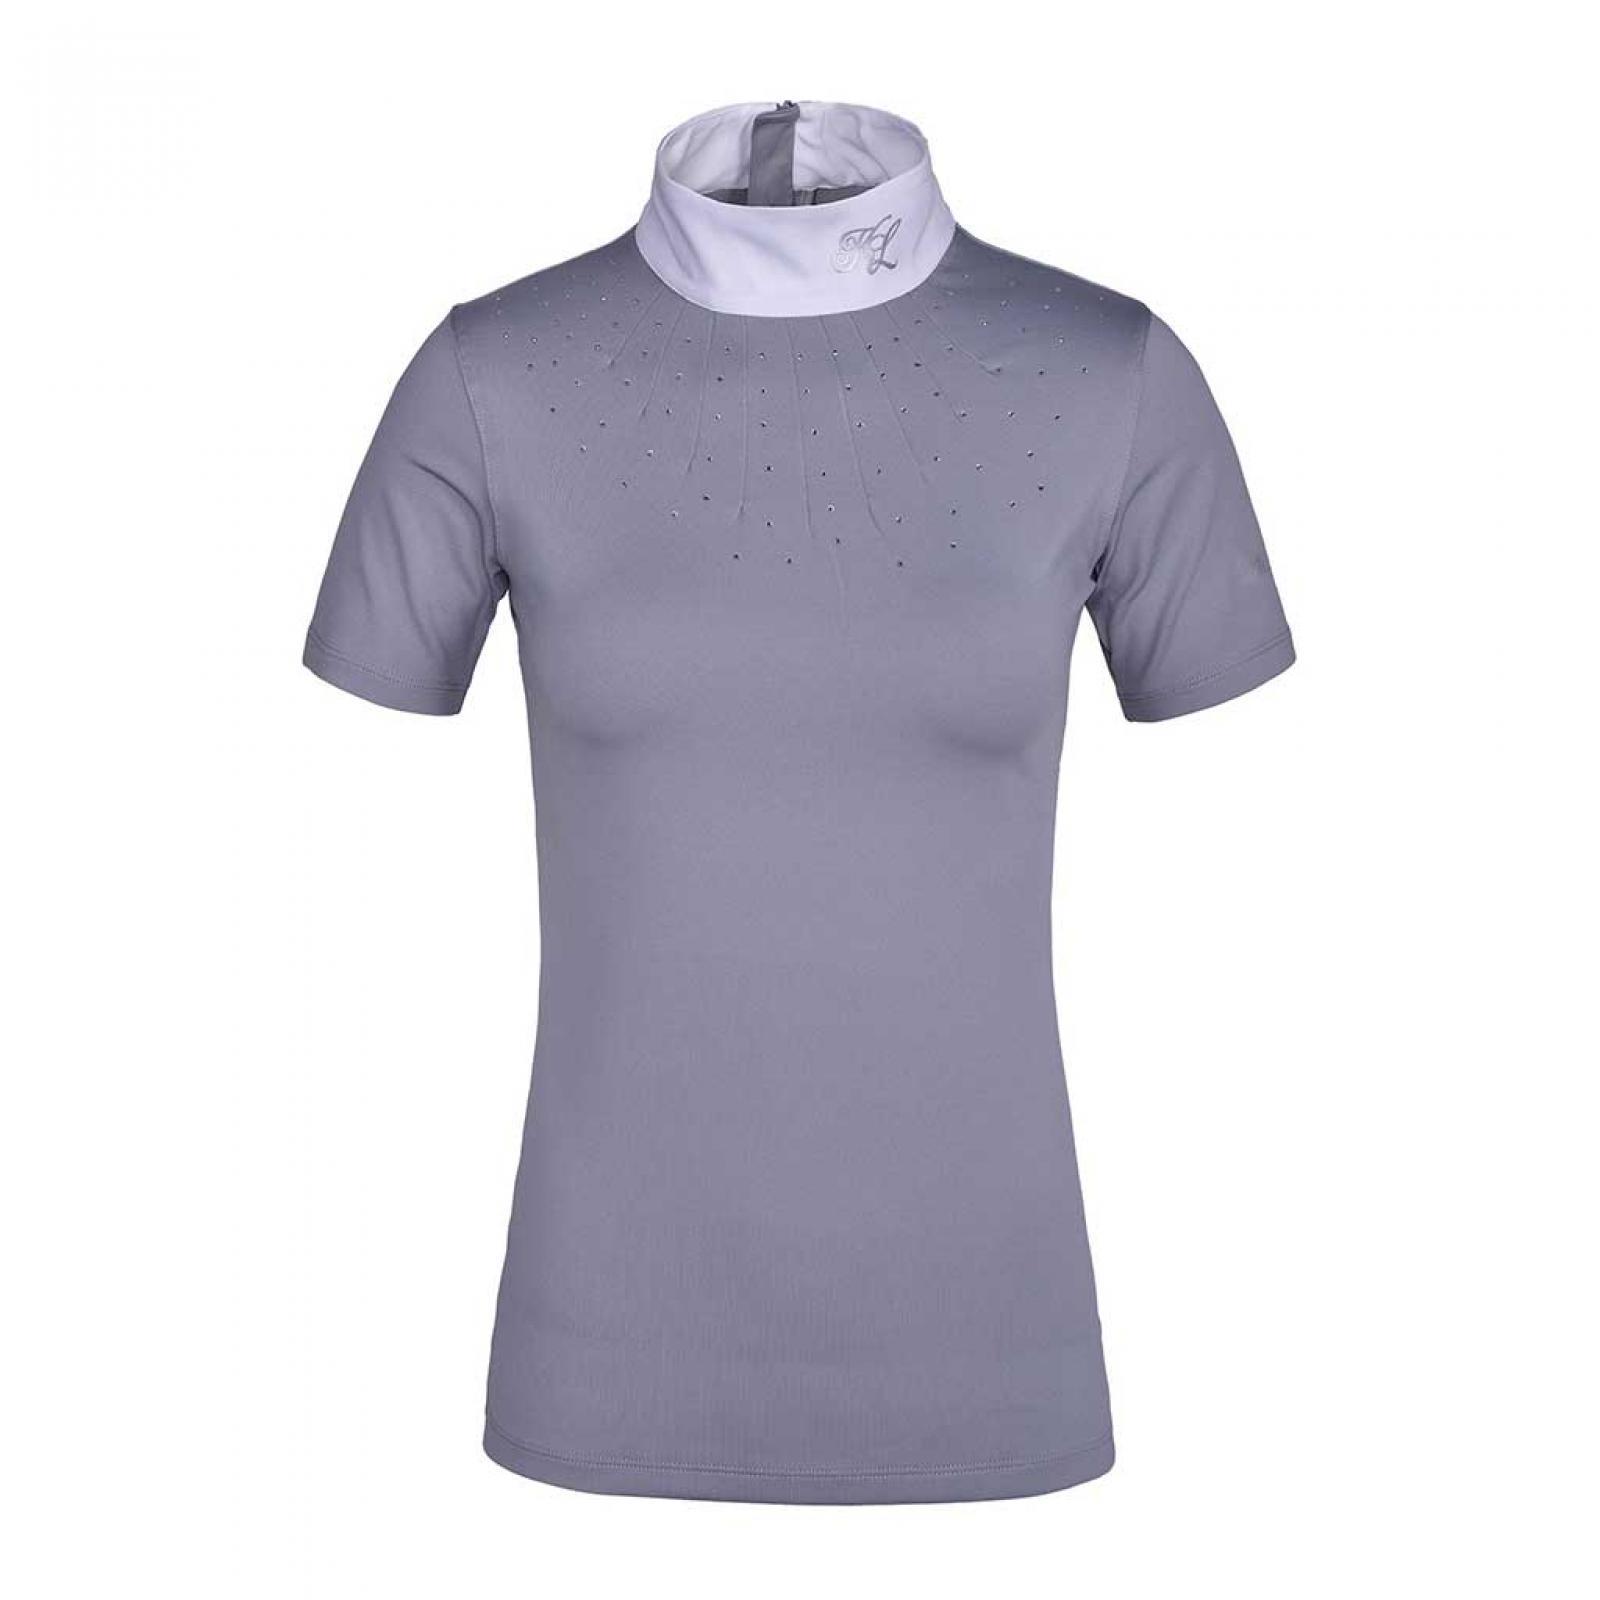 Kingsland Janna Show Shirt